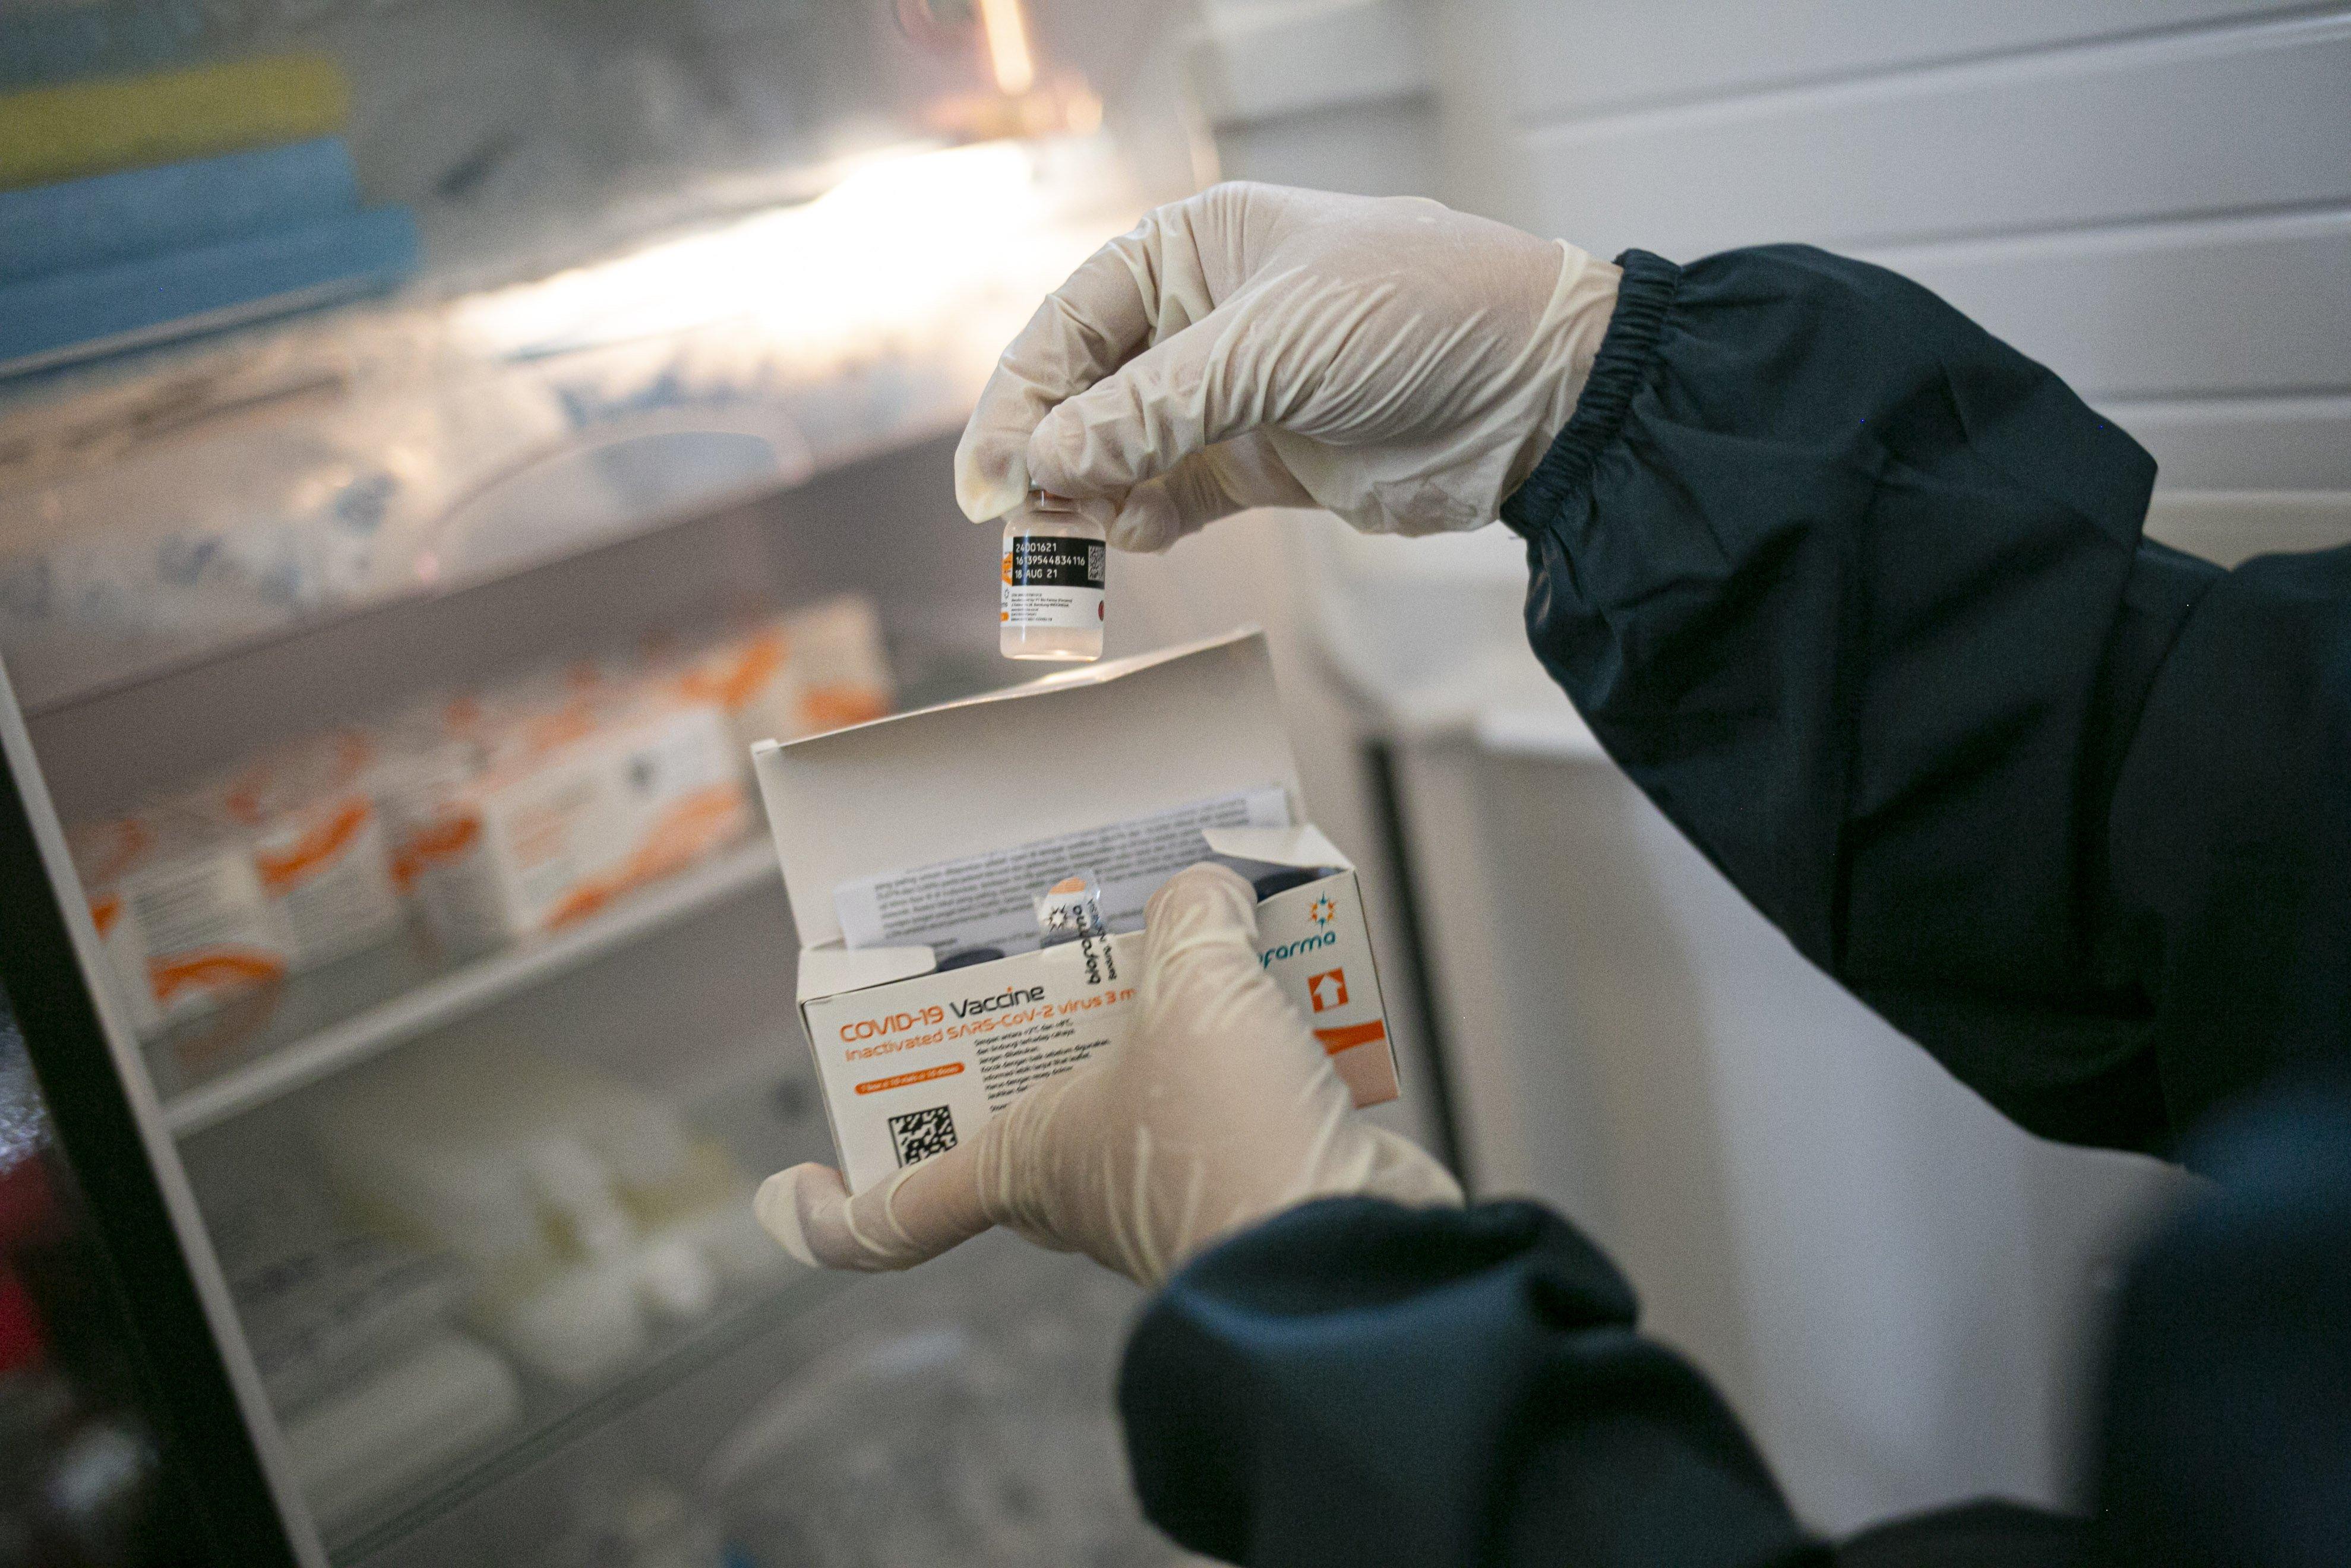 Petugas medis menyiapkan vaksin COVID-19 untuk pelaku UMKM di Ciputra Artpreneur, Jakarta, Kamis (1/4/2021). Kementerian Koperasi dan Usaha Kecil dan Menengah menyelenggarakan vaksinasi COVID-19 massal bagi 1.500 pelaku Usaha mikro kecil menengah (UMKM) di DKI Jakarta dengan target vaksinasi untuk pelaku UMKM tersebut mencapai 250.000 orang.